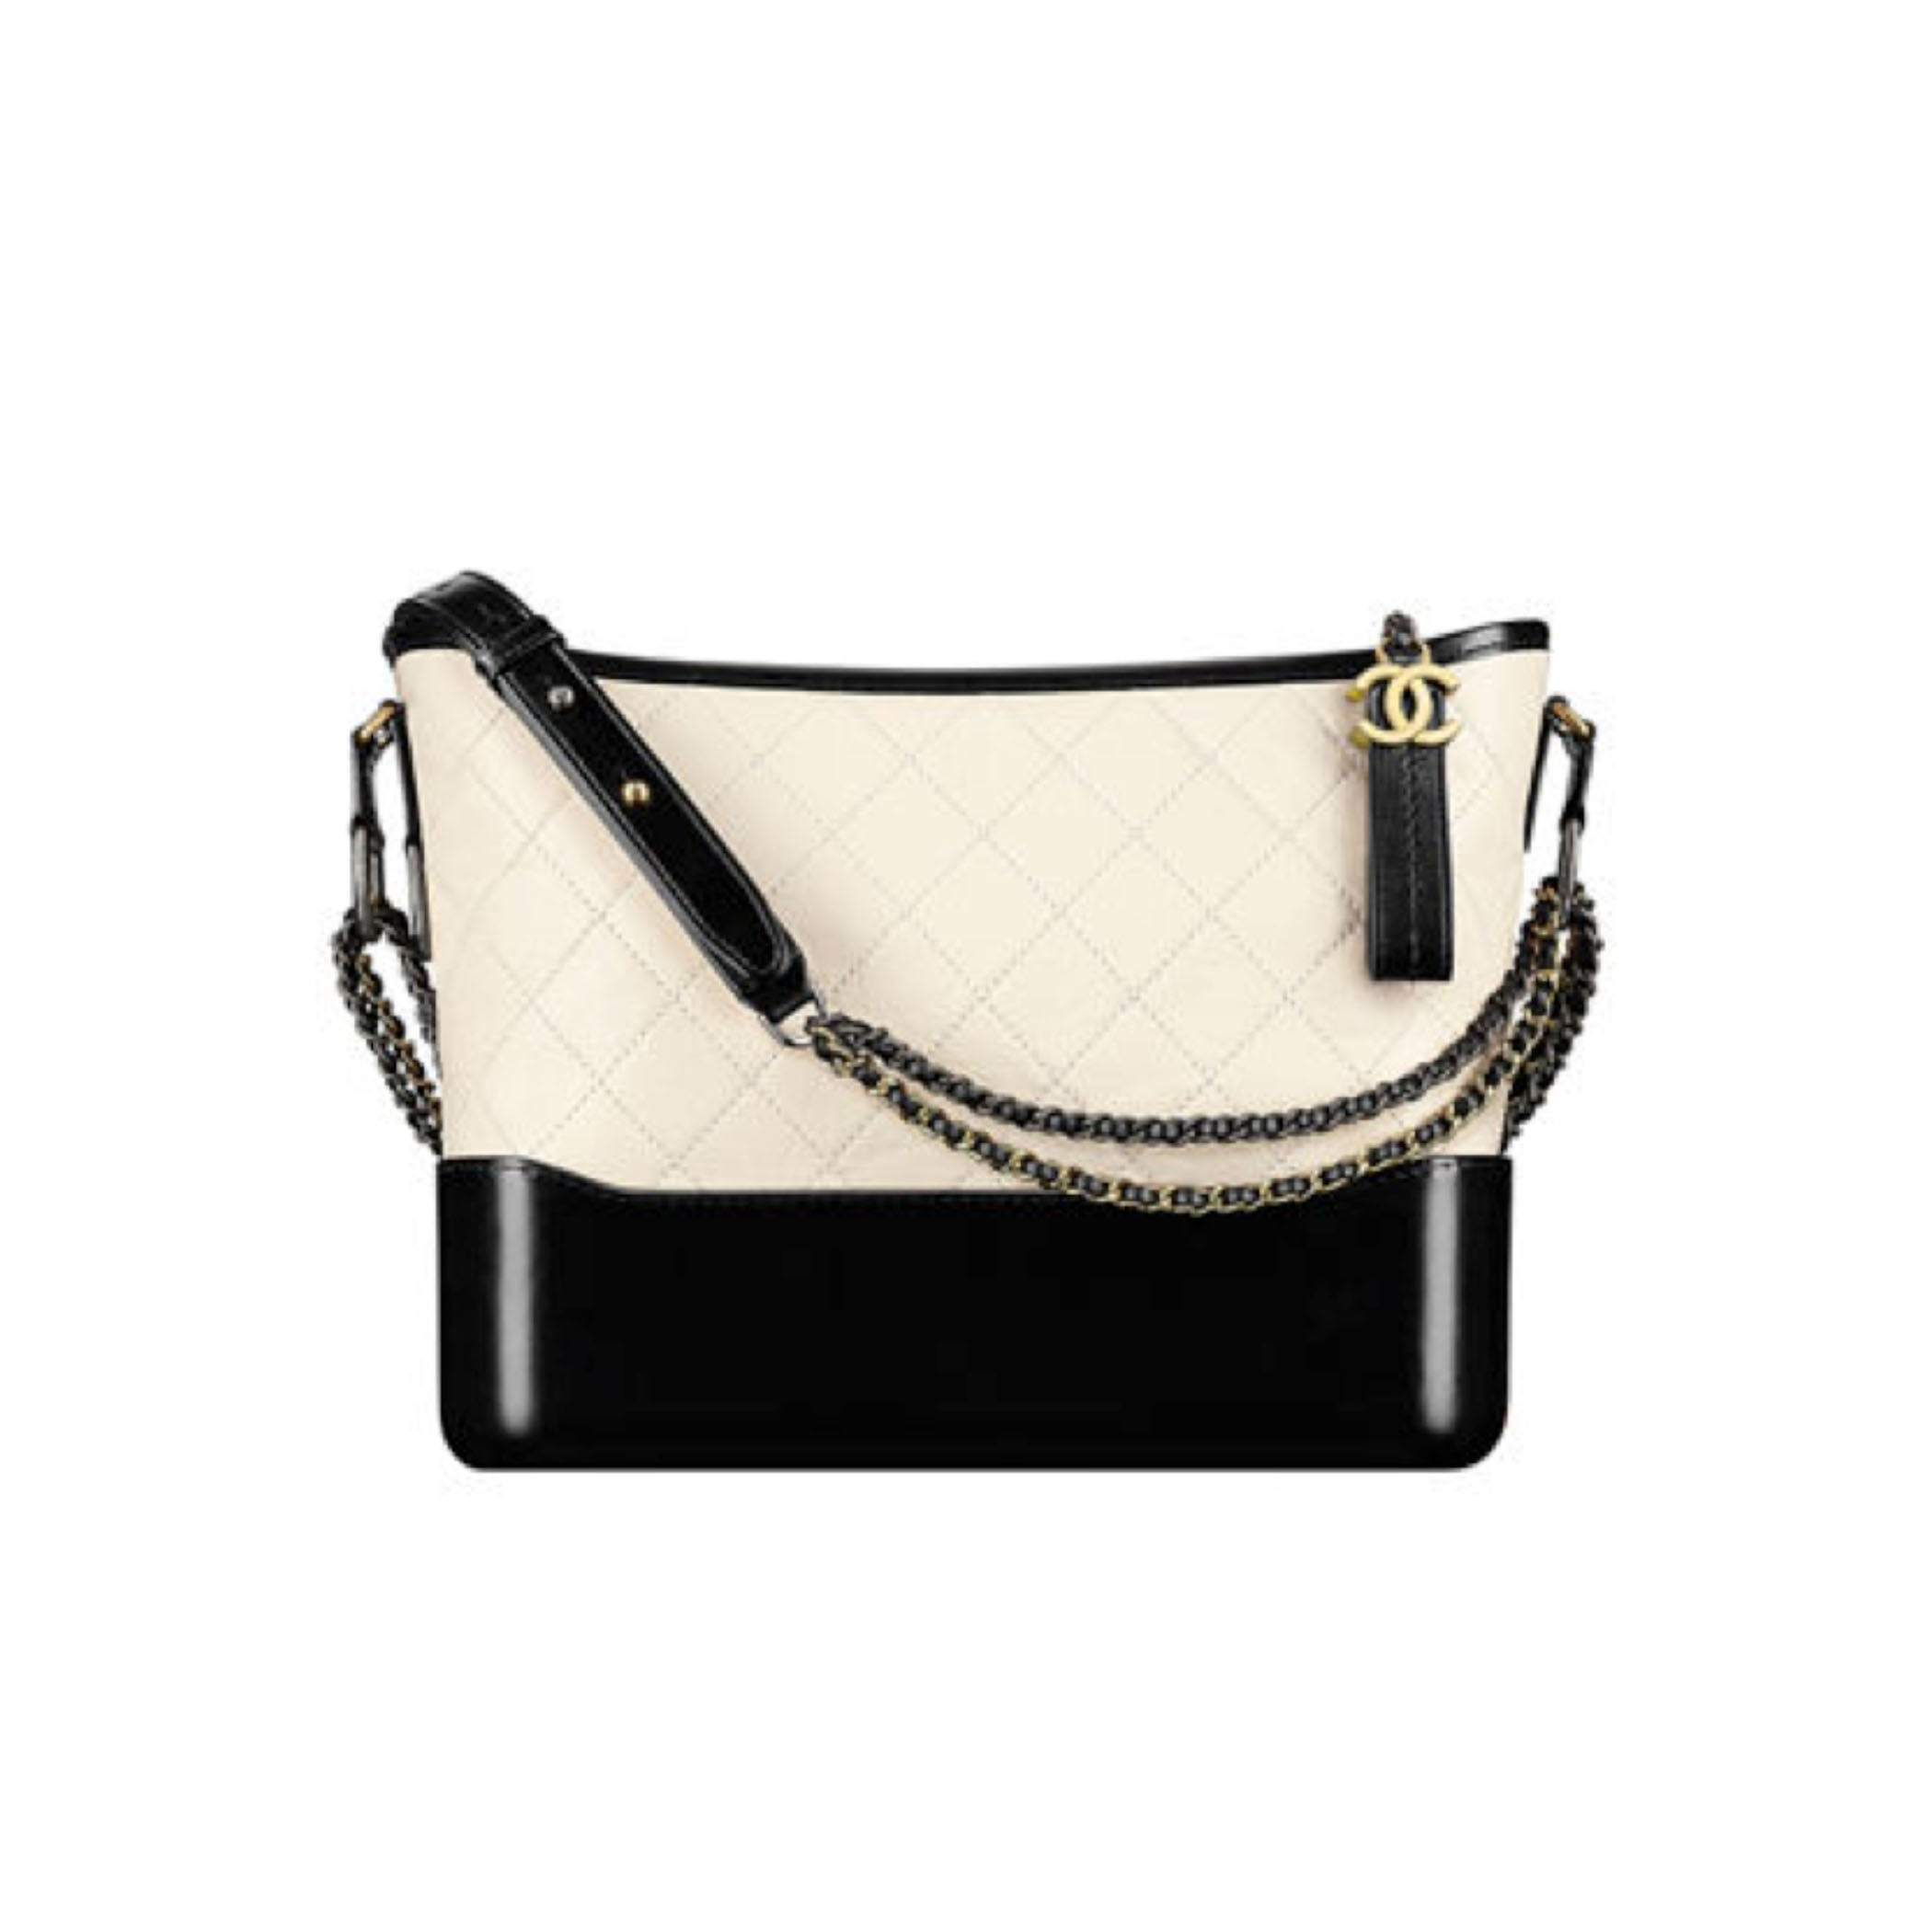 5c5f205abe7e ... Handbag Math  You Can Still Save Money Buying Chanel Abroad (Chanel  Gabrielle Bag Case Study)